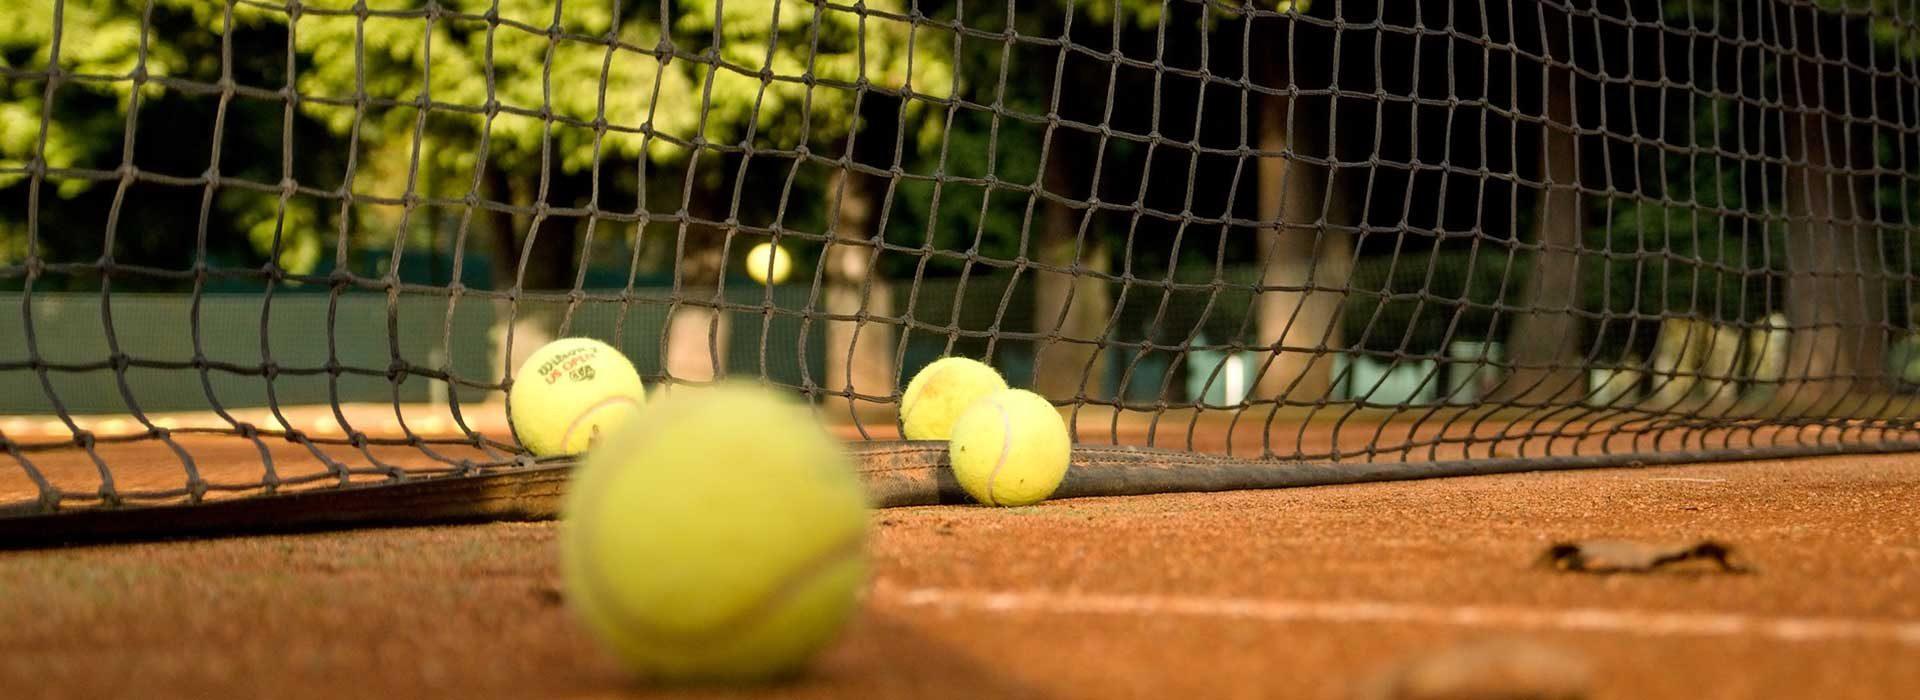 Tennis 2740178 1920